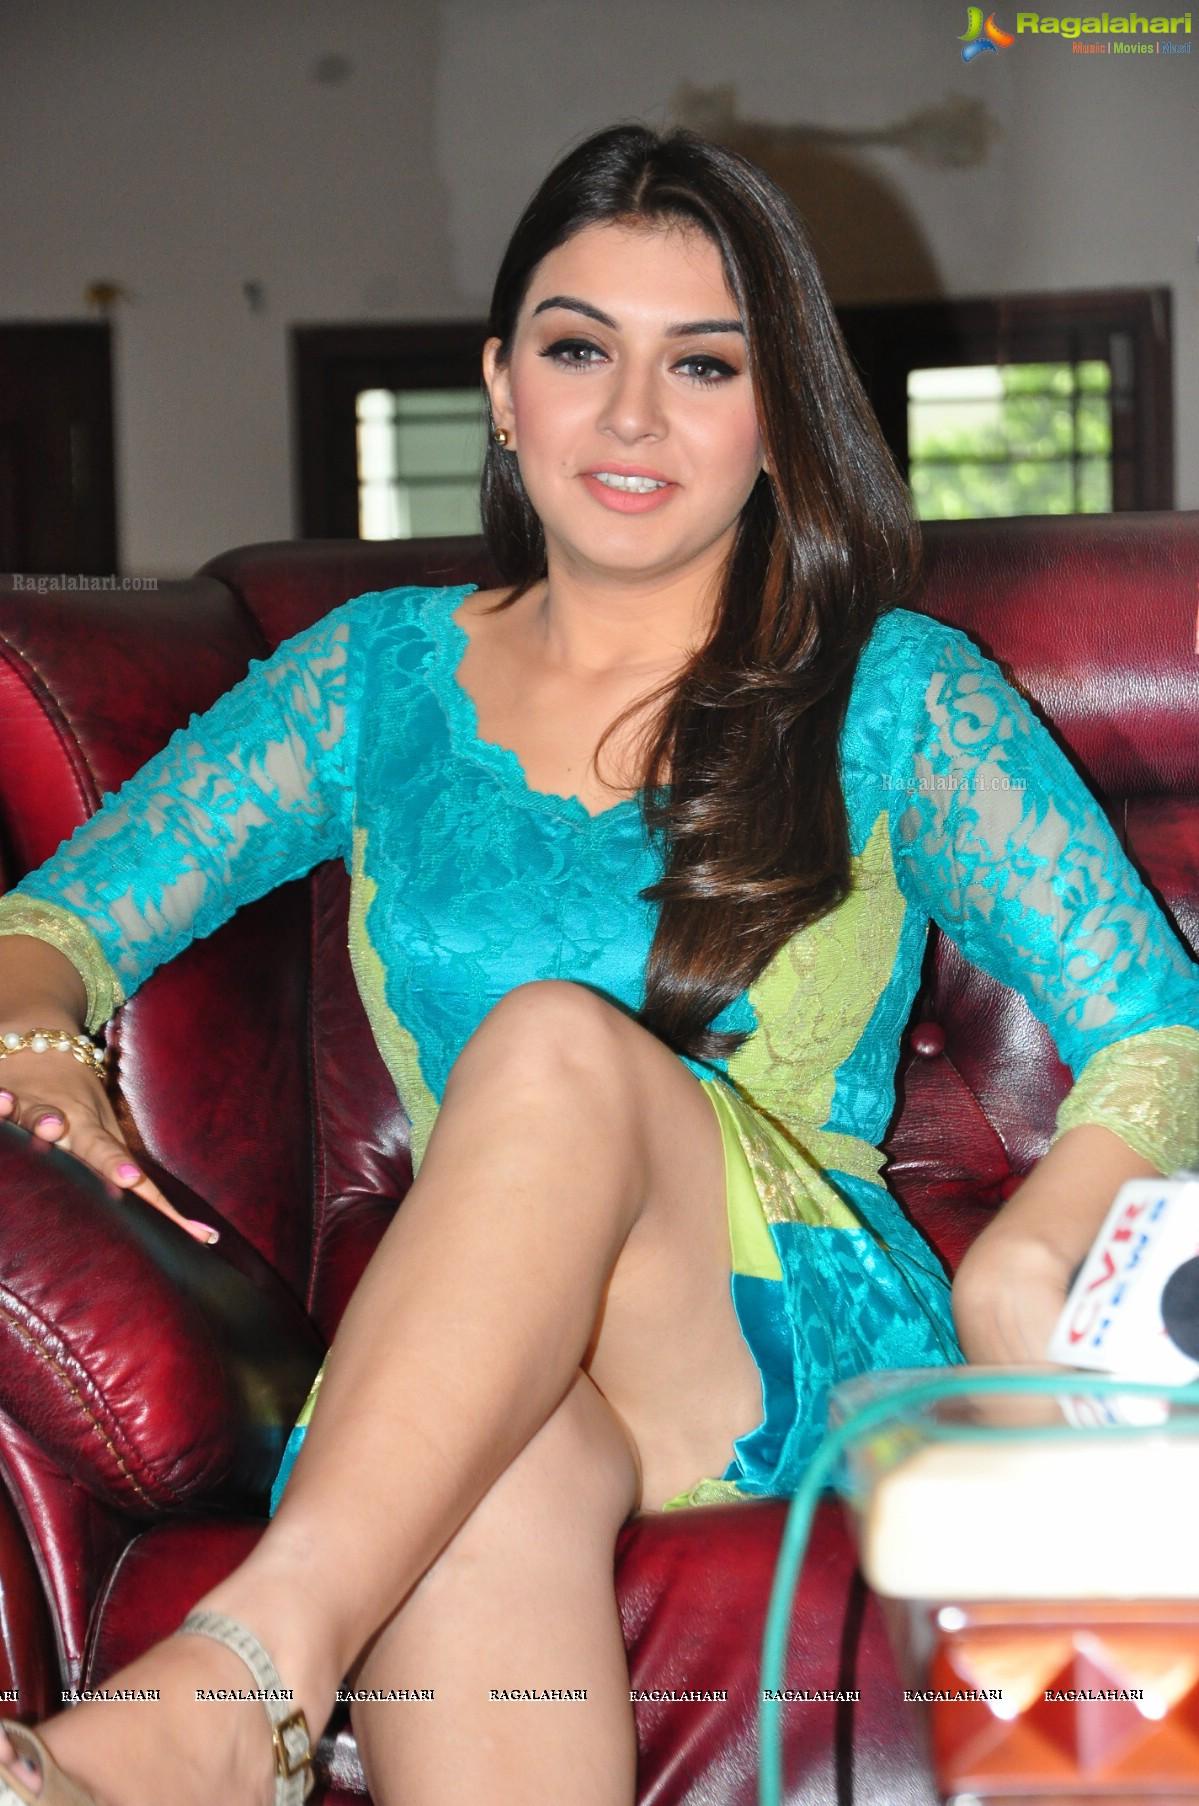 hansika motwani image 5 | latest actress galleries,images, photos